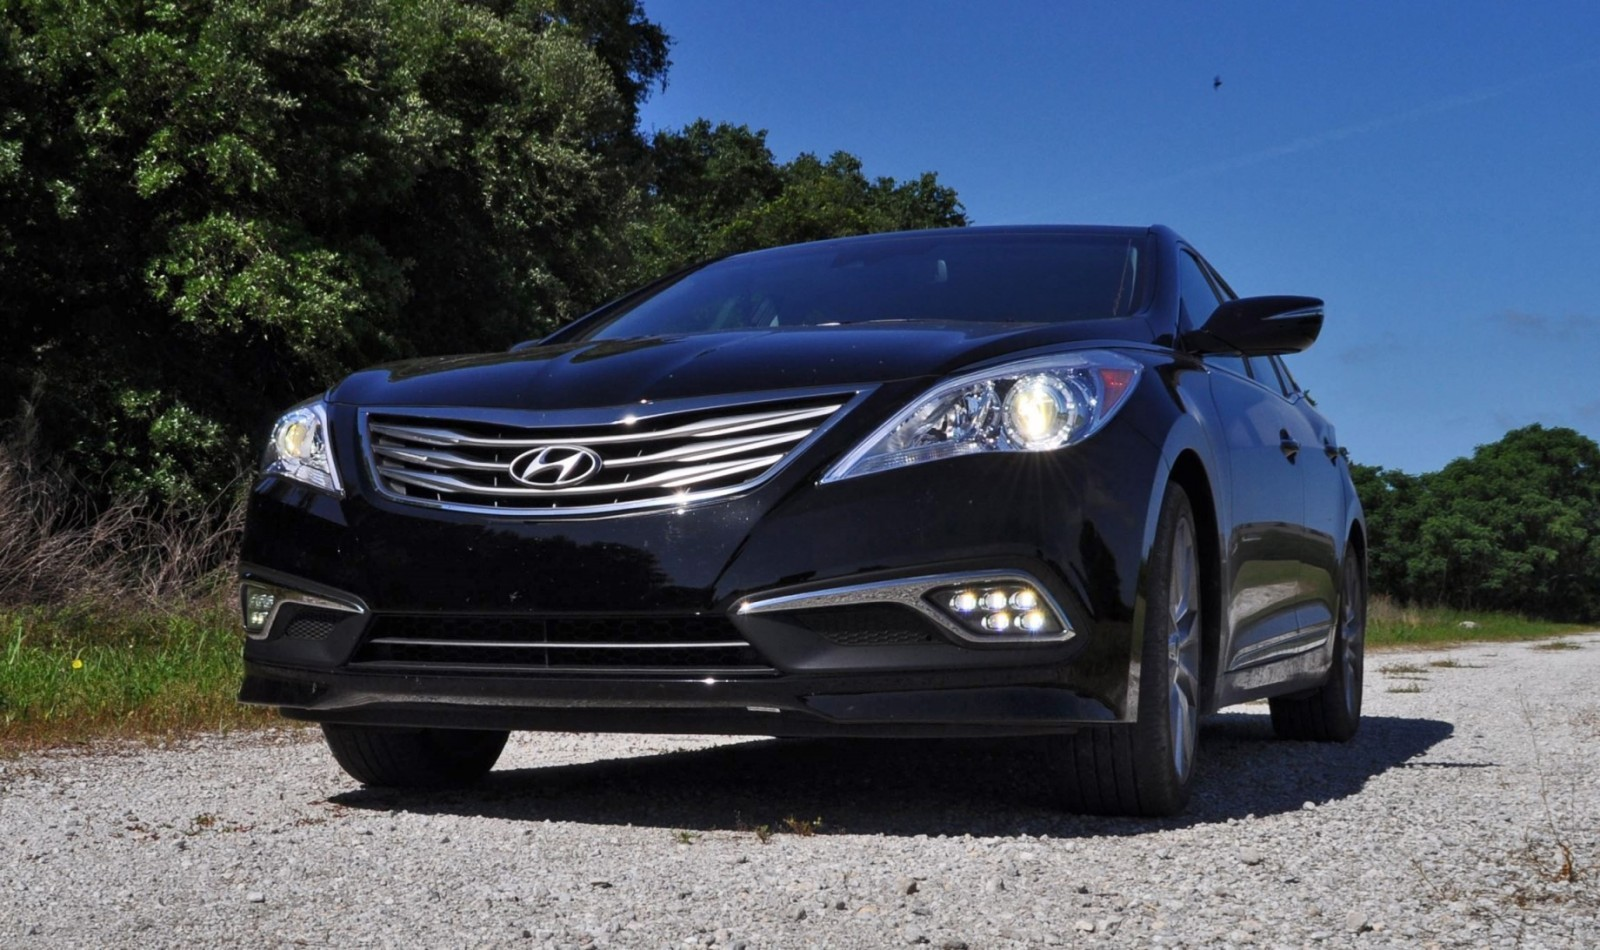 Road Test Review - 2015 Hyundai AZERA Limited 26